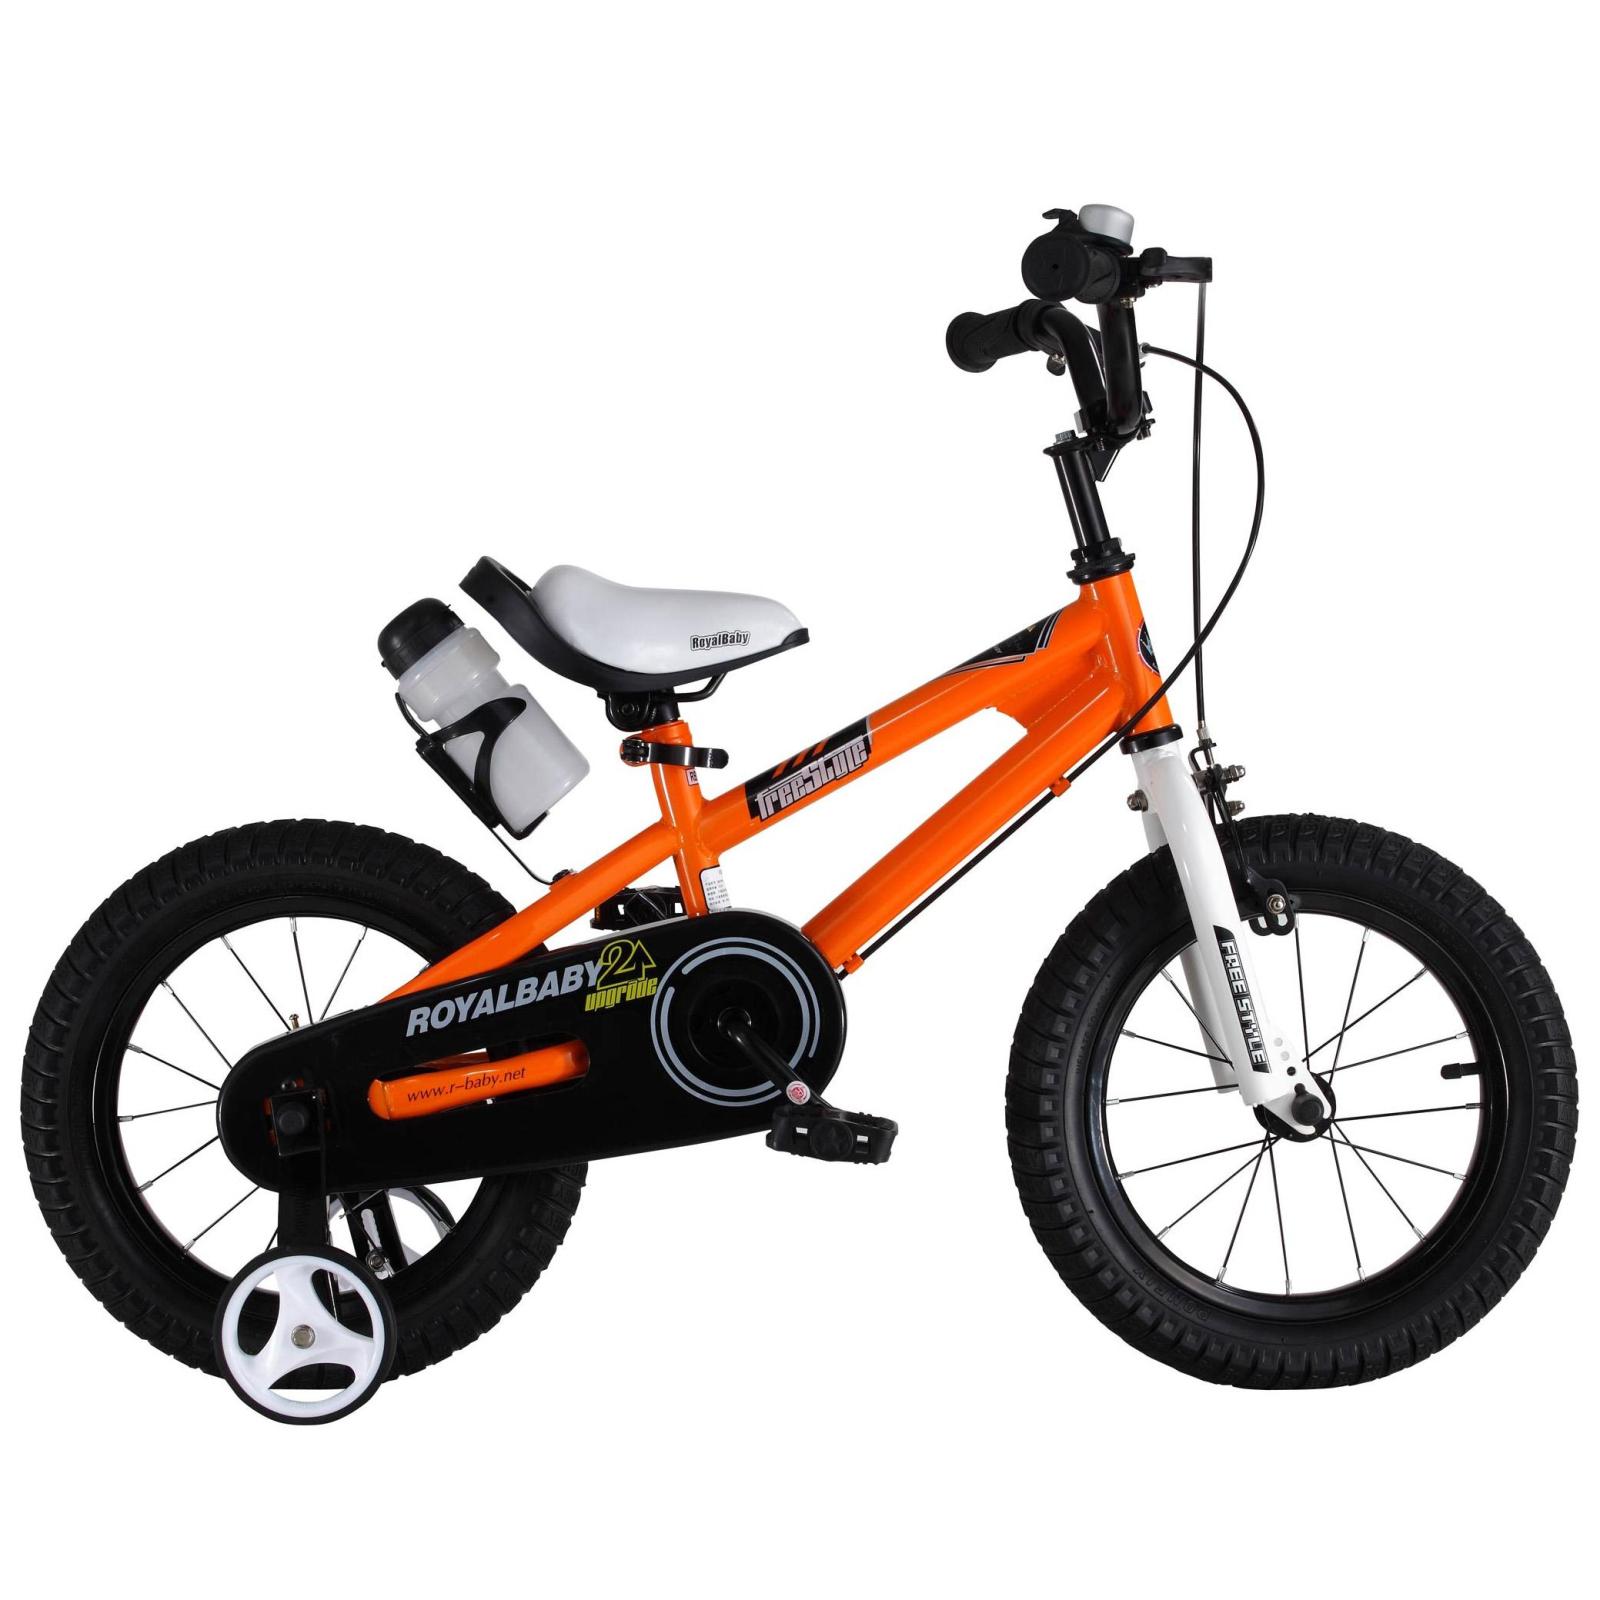 "Детский велосипед Royal Baby FREESTYLE 14"", оранжевый (RB14B-6-ORG)"